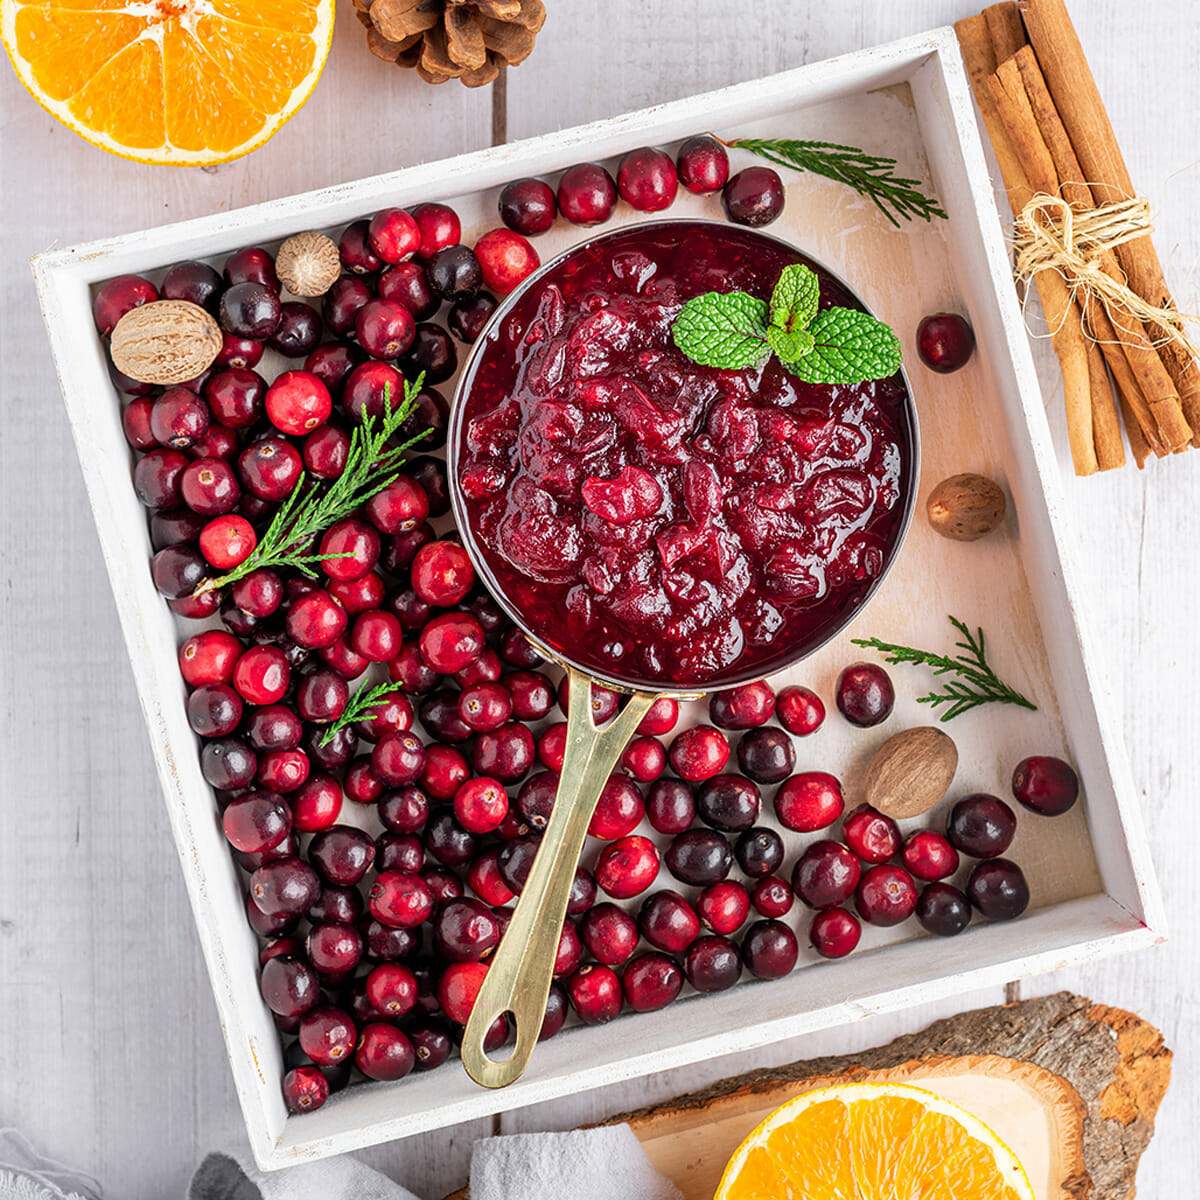 Recipe for Instant Pot Cranberry Sauce